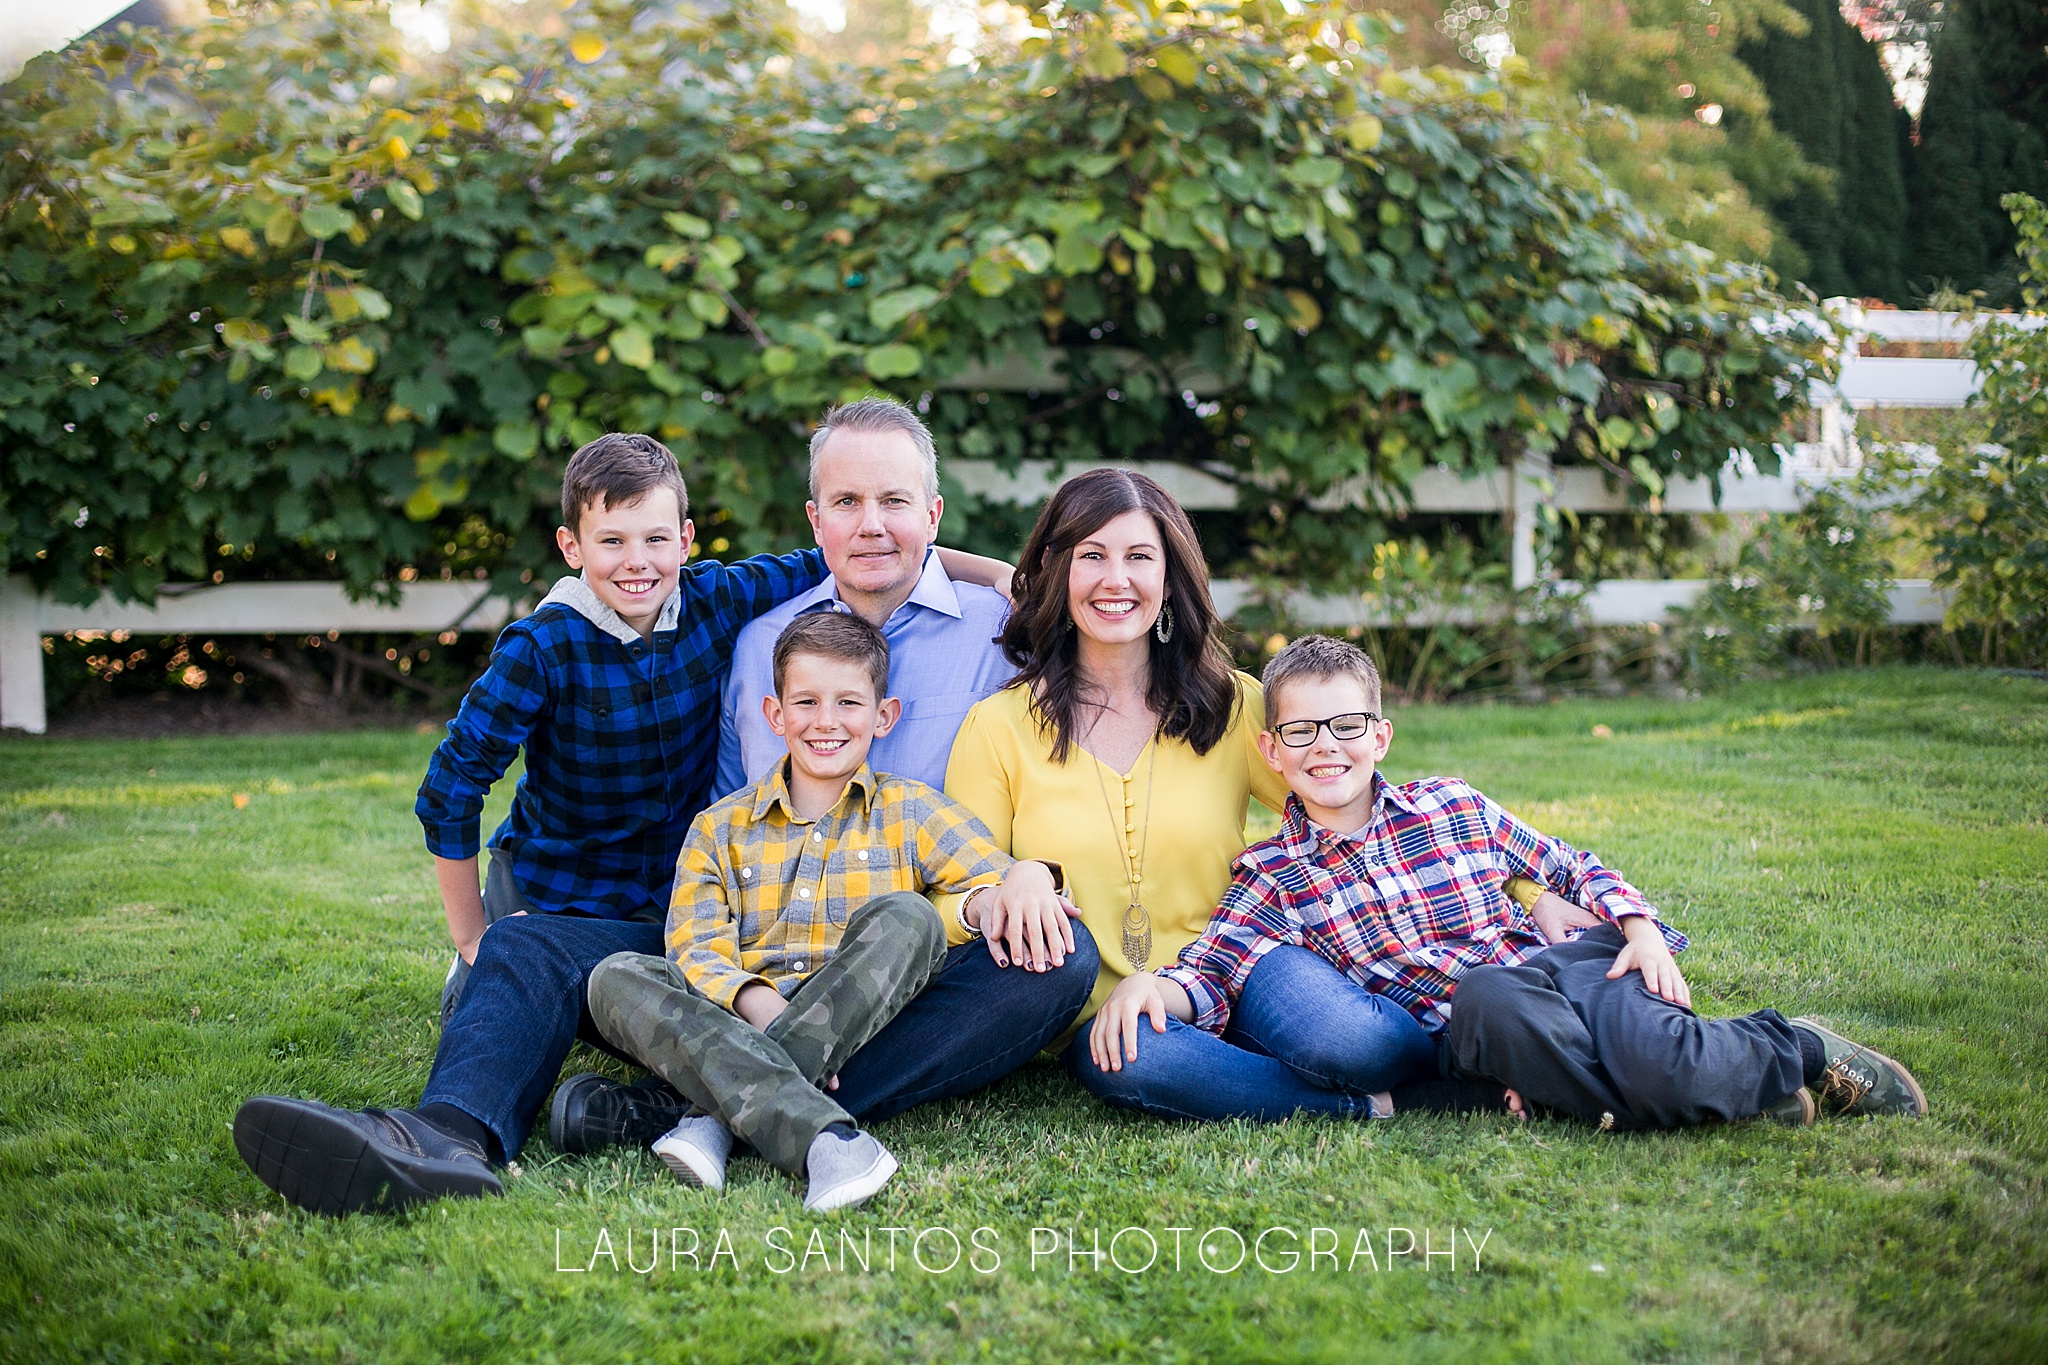 Laura Santos Photography Portland Oregon Family Photographer_0720.jpg